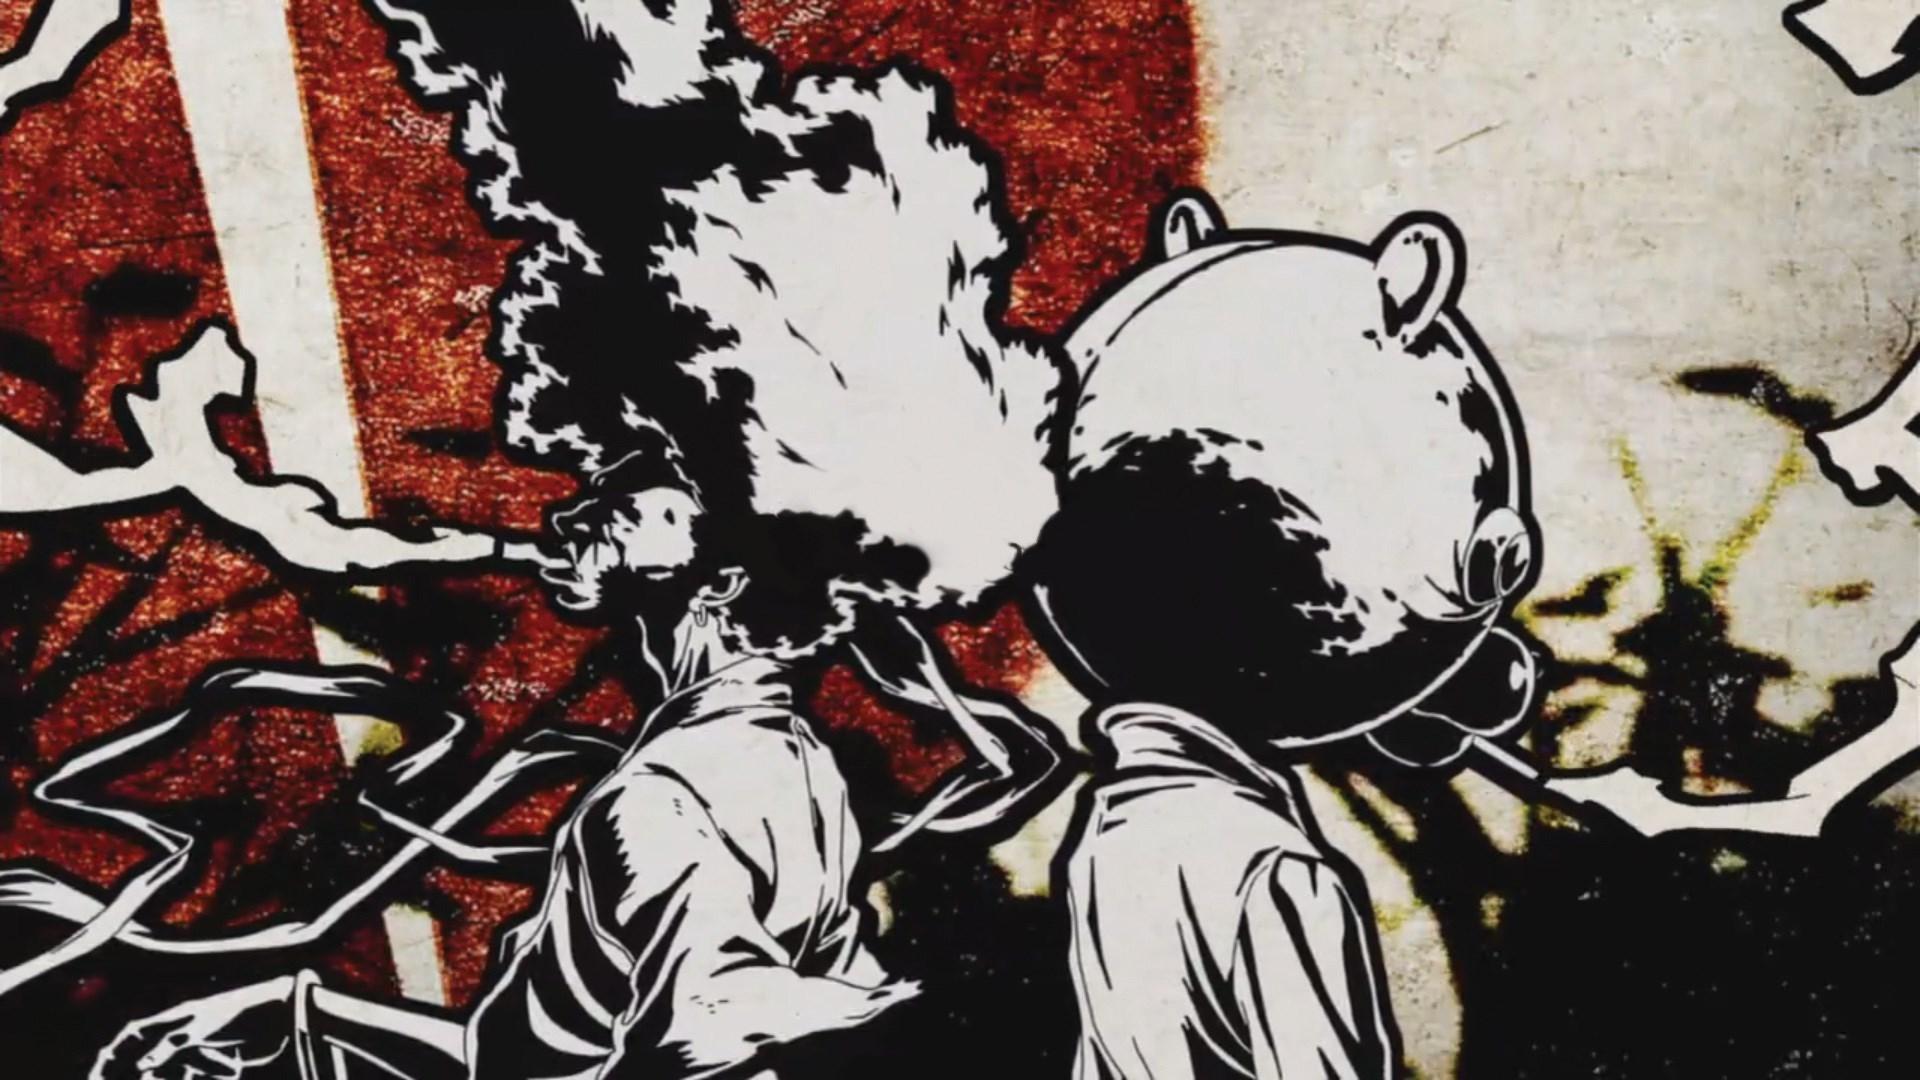 afro-samurai-hd-wallpaper-wpt7601662